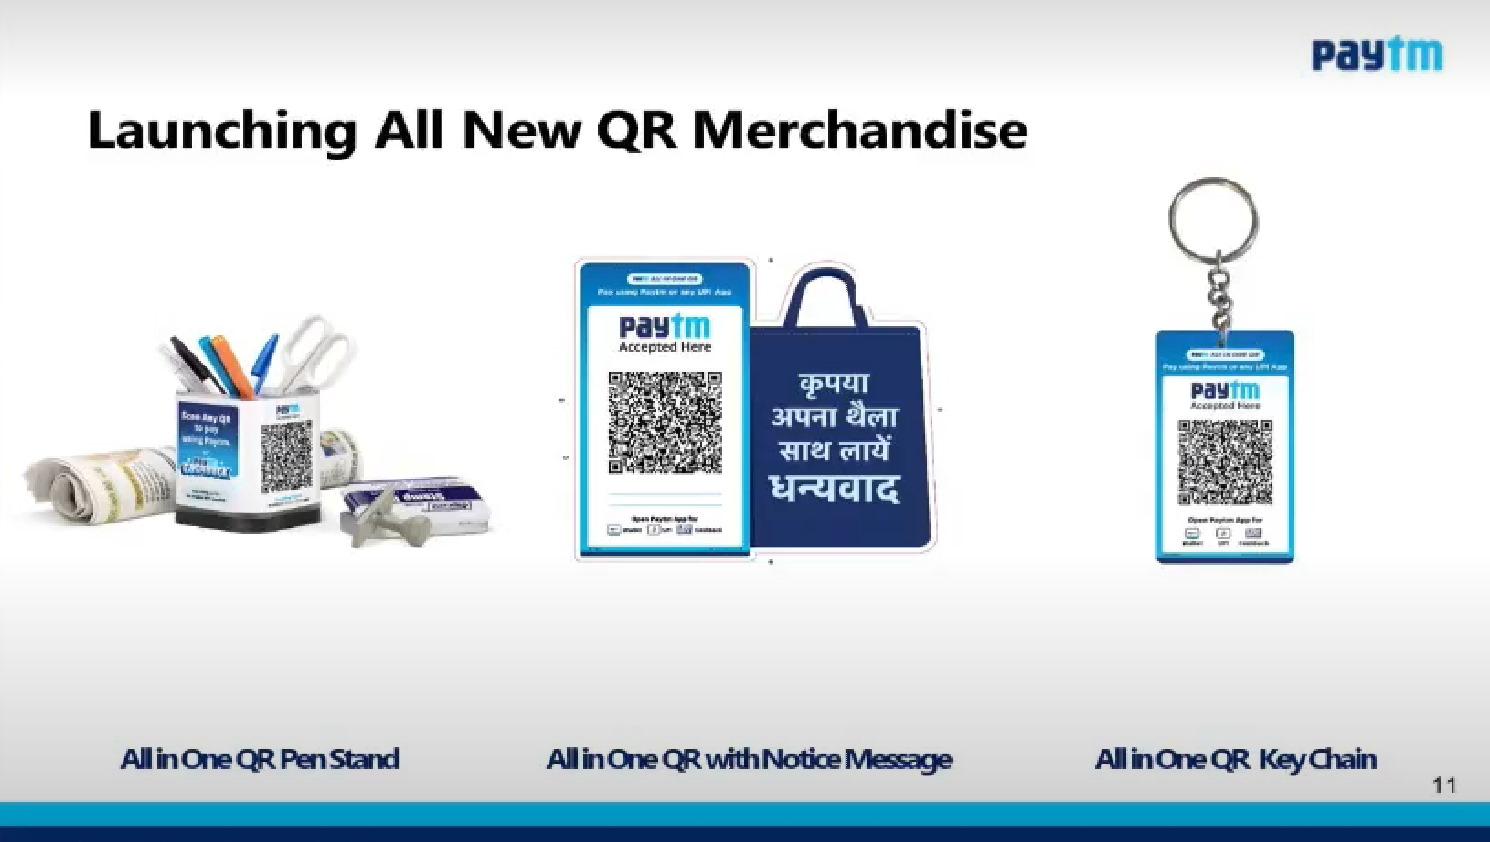 paytm QR merchandise – 2